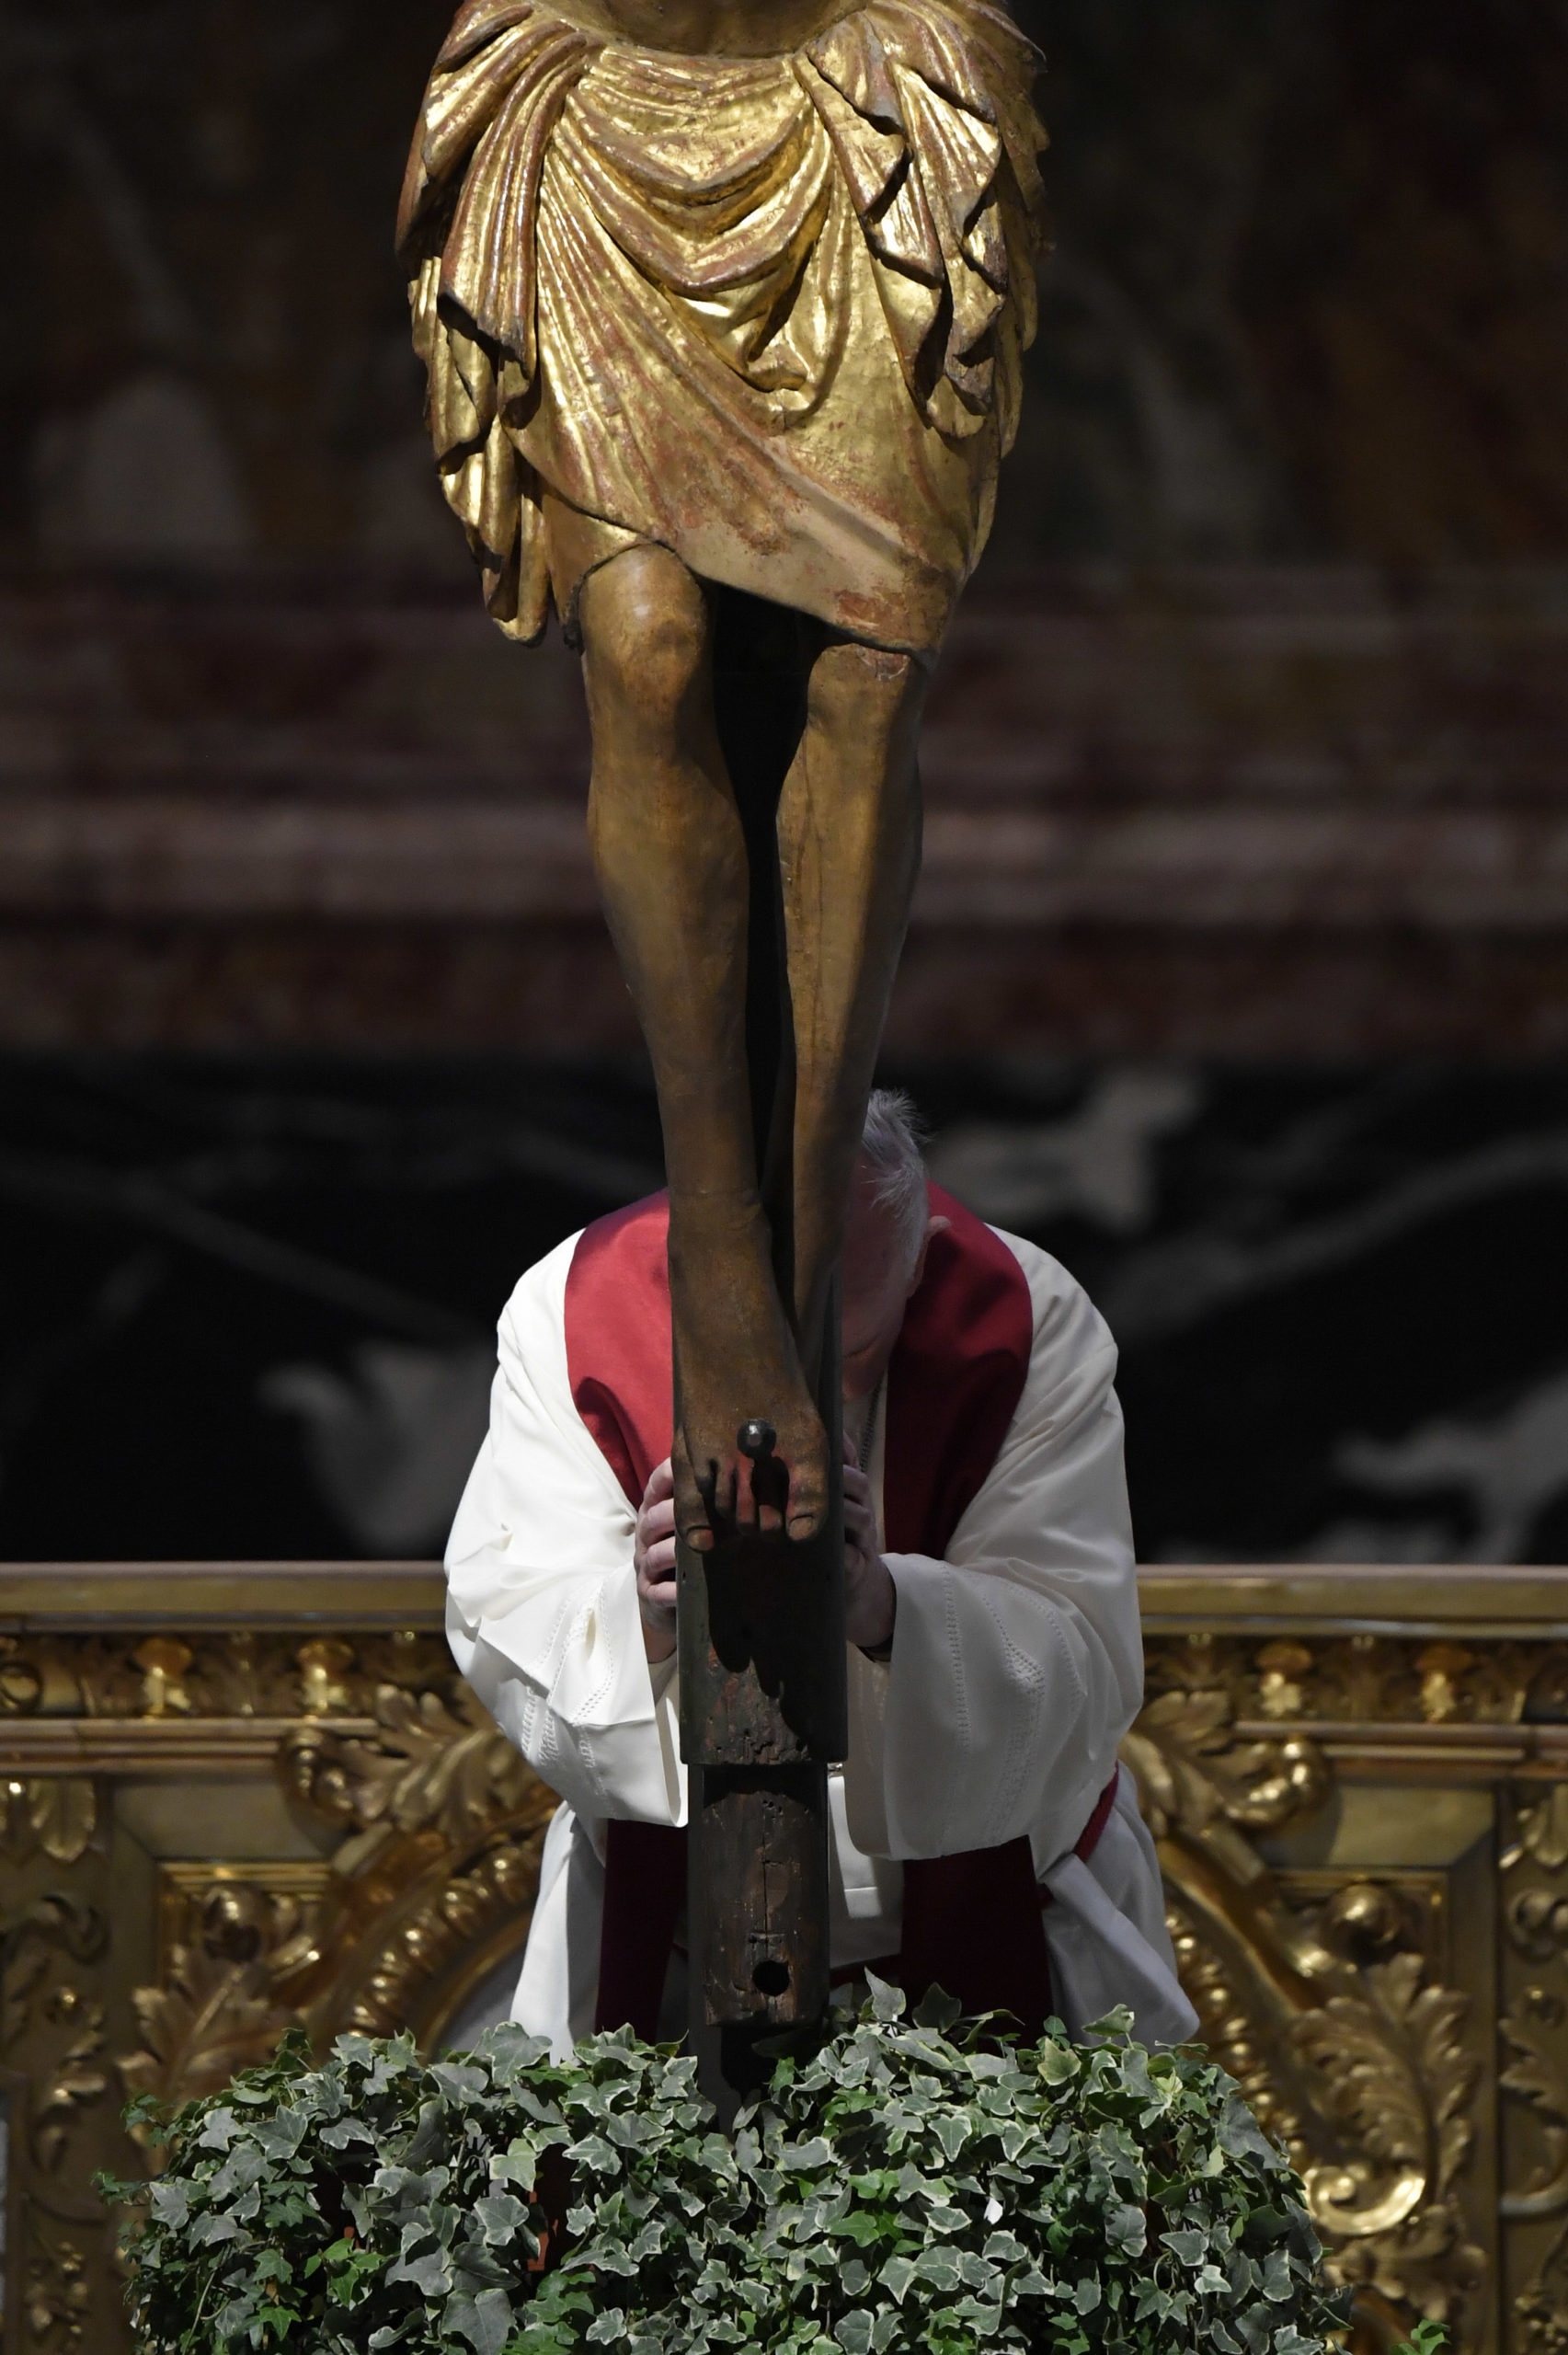 Célébration de la Passion, Vendredi Saint, 10 avril 2020 © Vatican Media